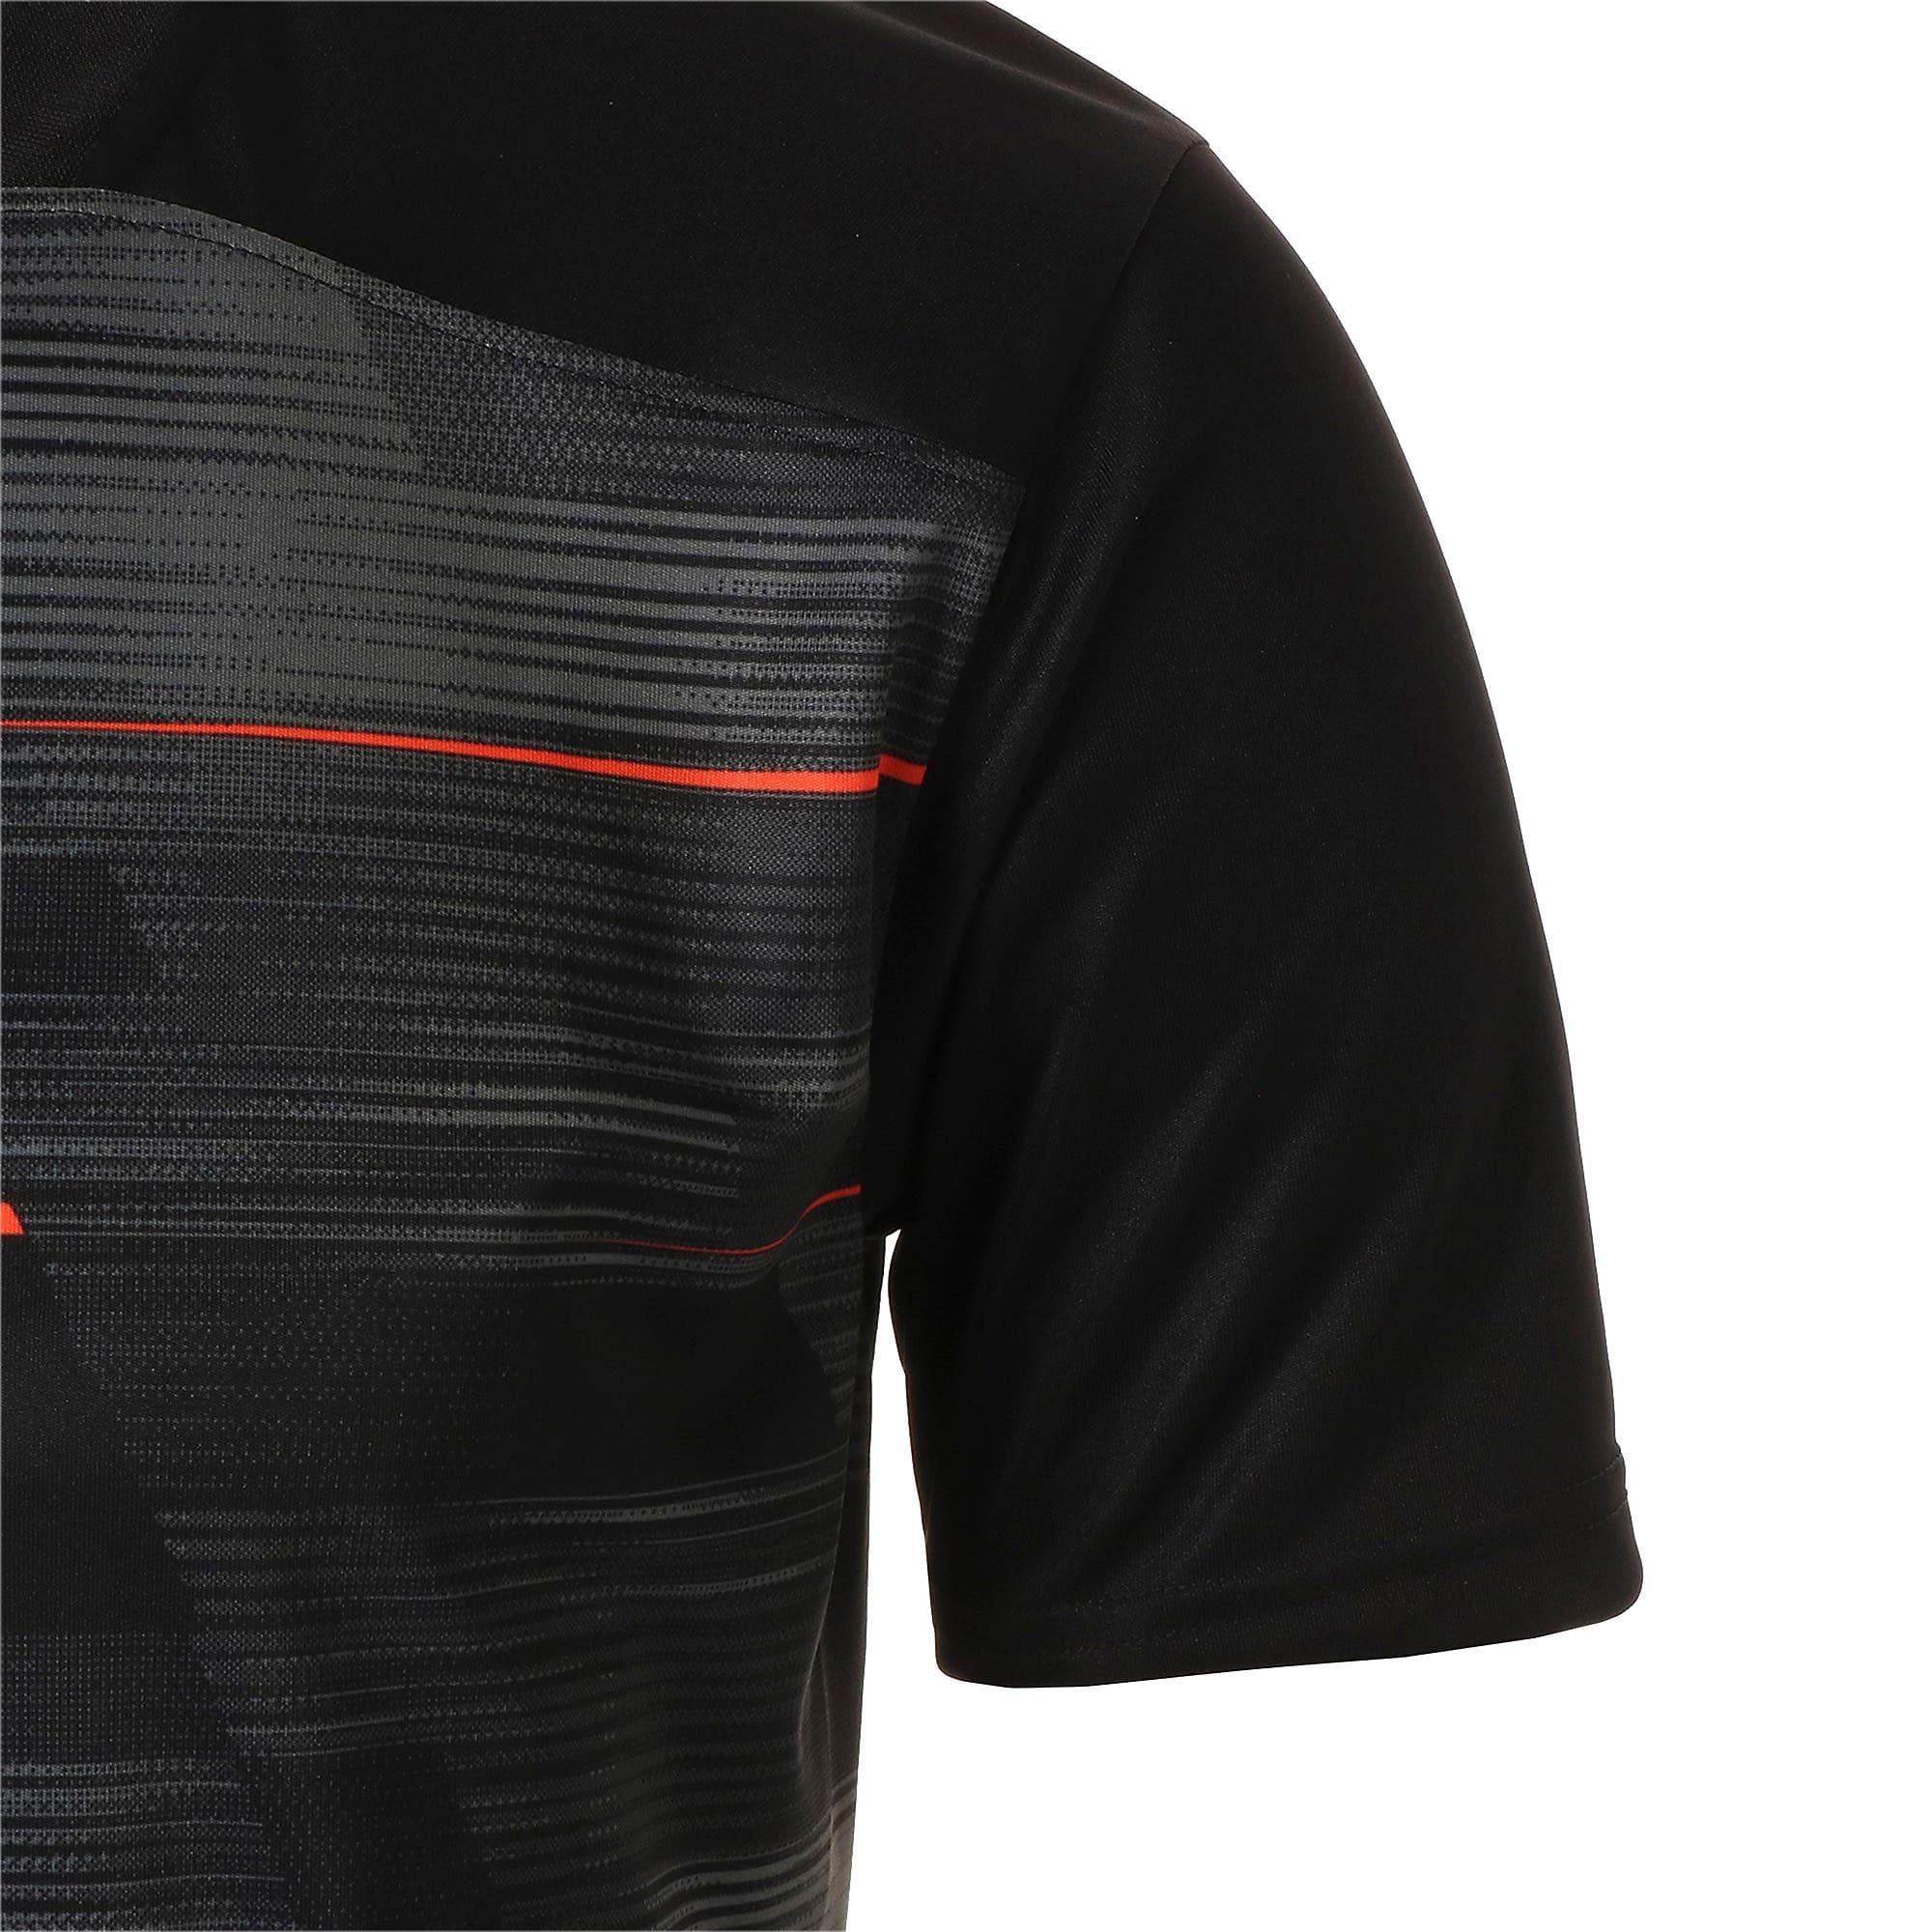 Thumbnail 6 of FTBLNXT グラフィック シャツ, Puma Black-Nrgy Red, medium-JPN